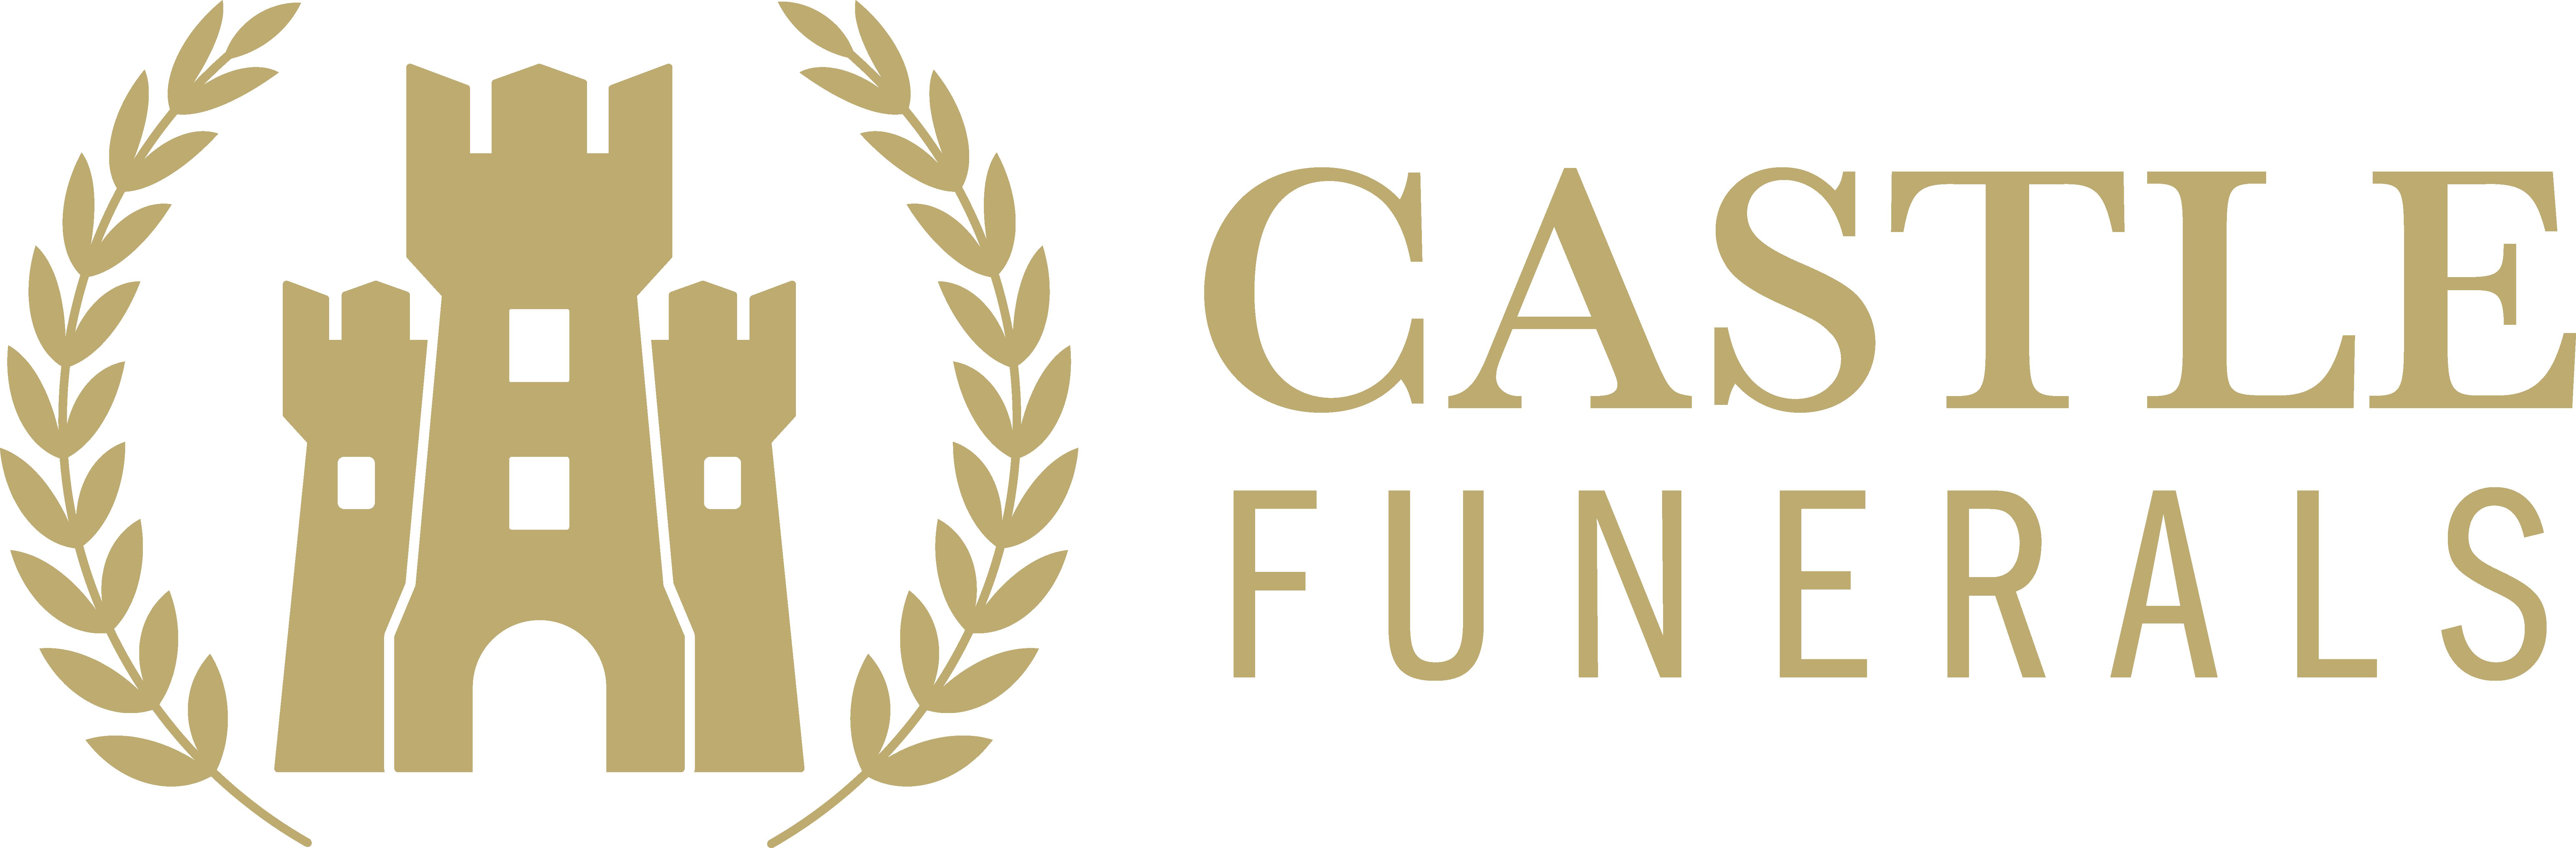 Castle Funerals Logo